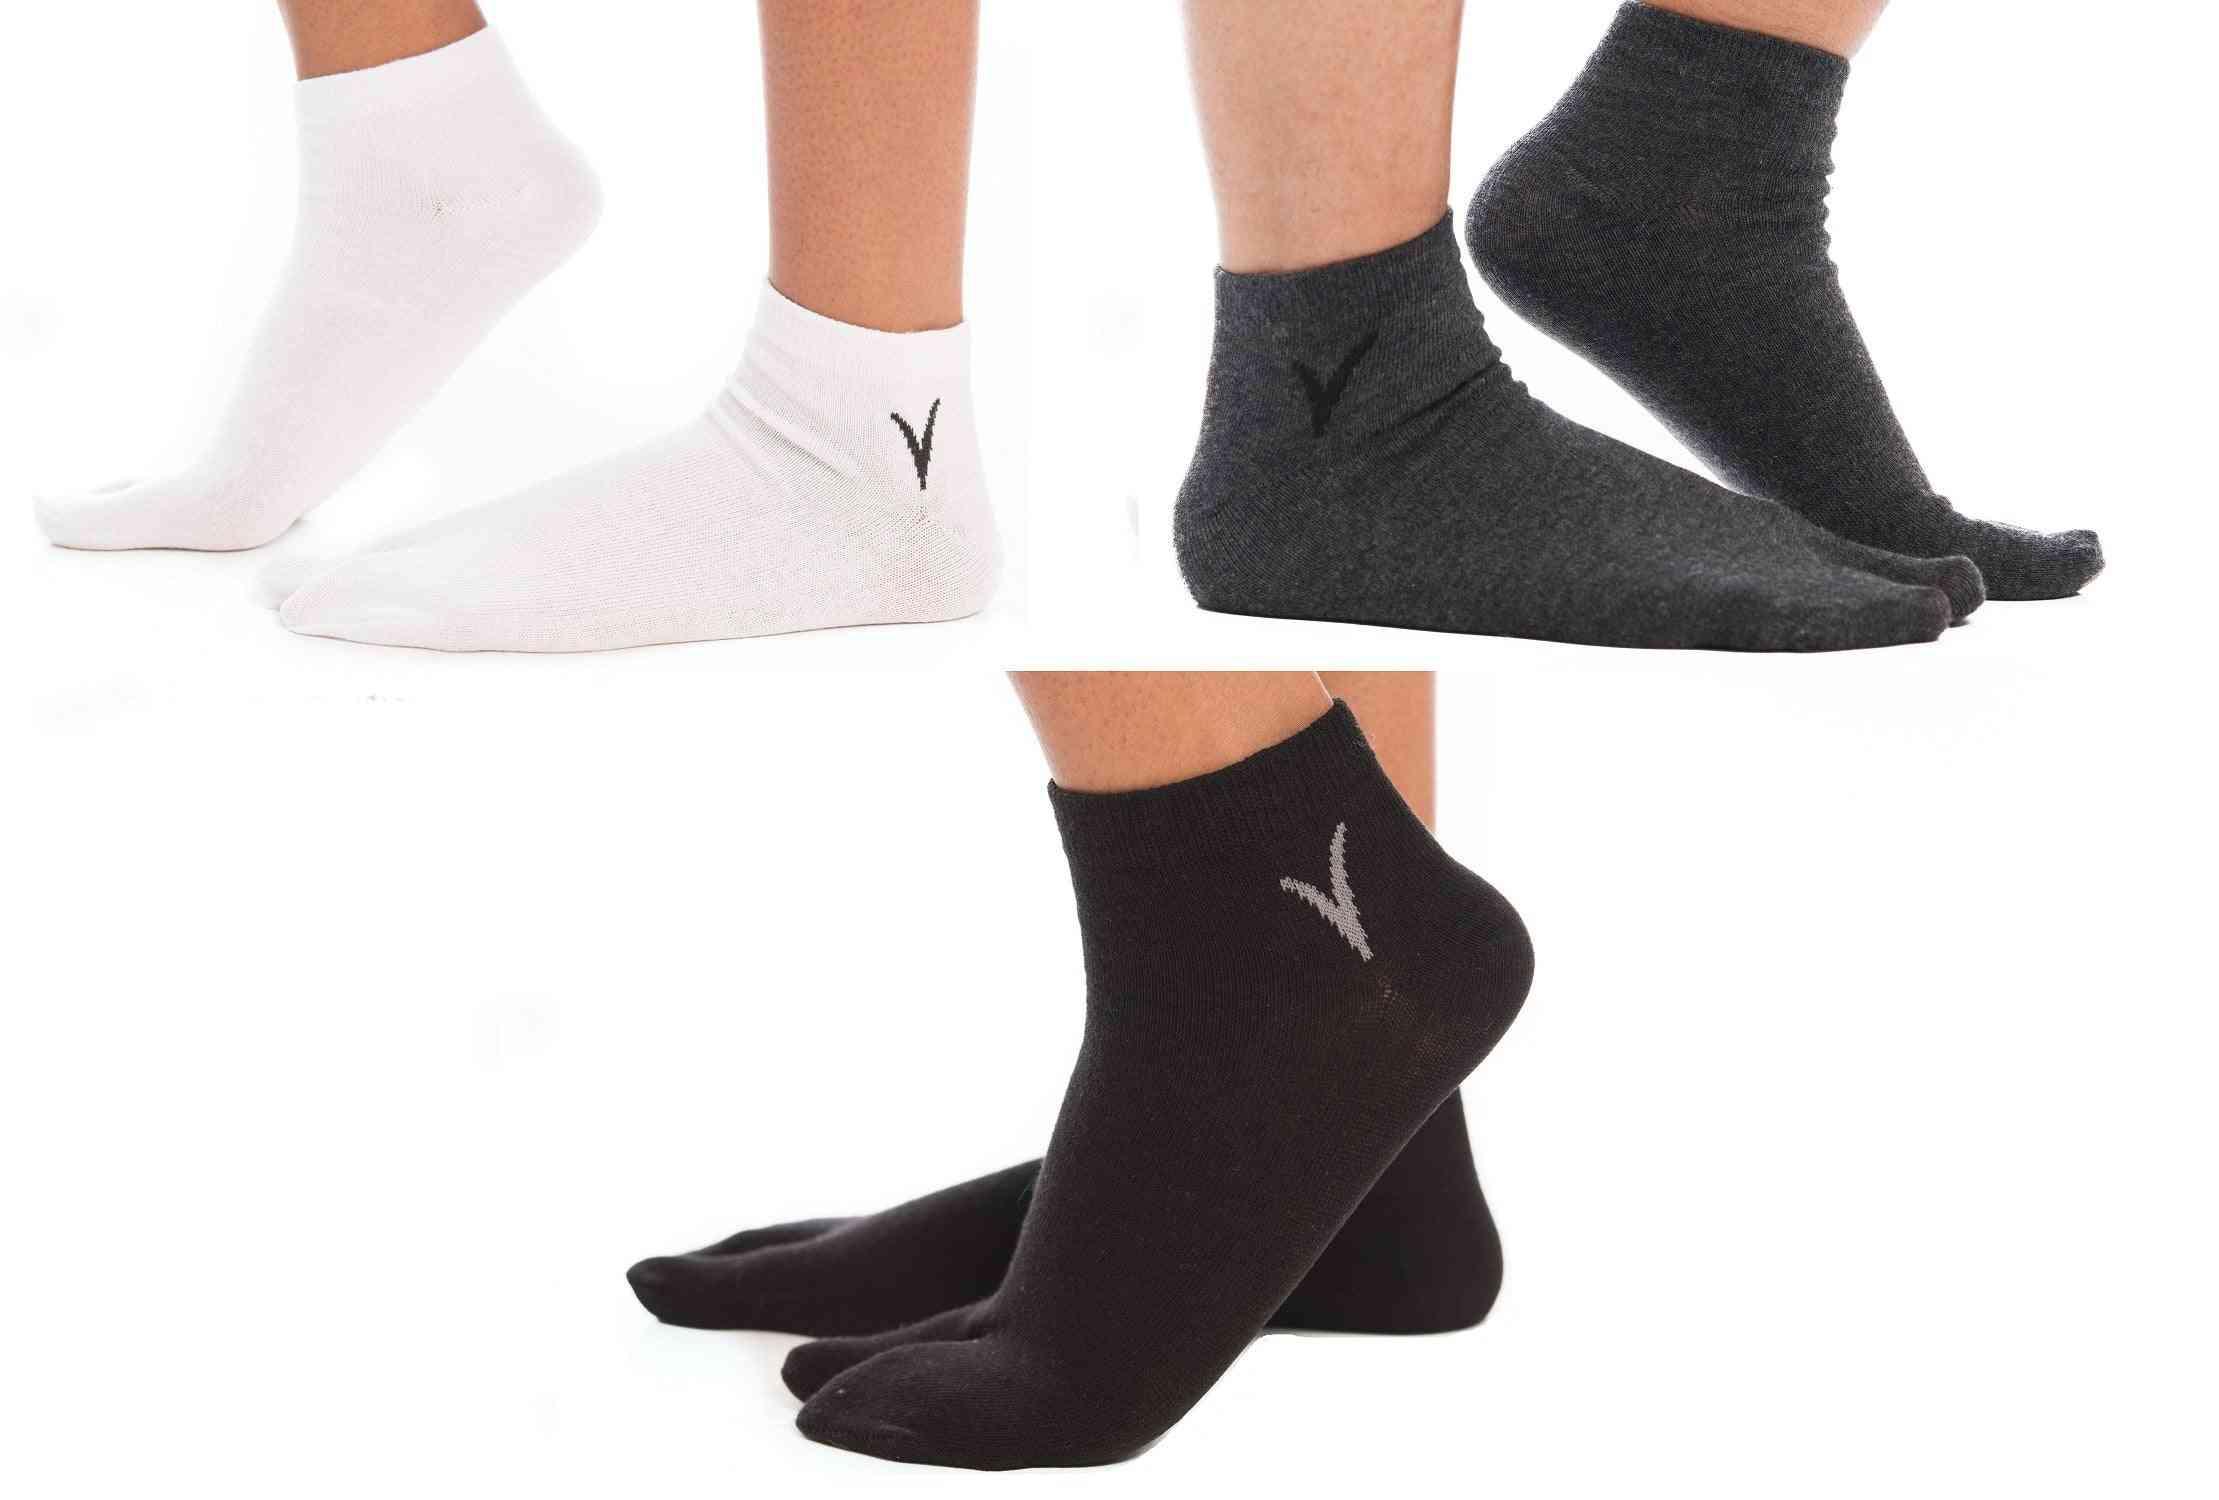 Flip Flop Tabi Big Toe Socks - White, Gunmetal Grey, Black Ankle -3 Pairs